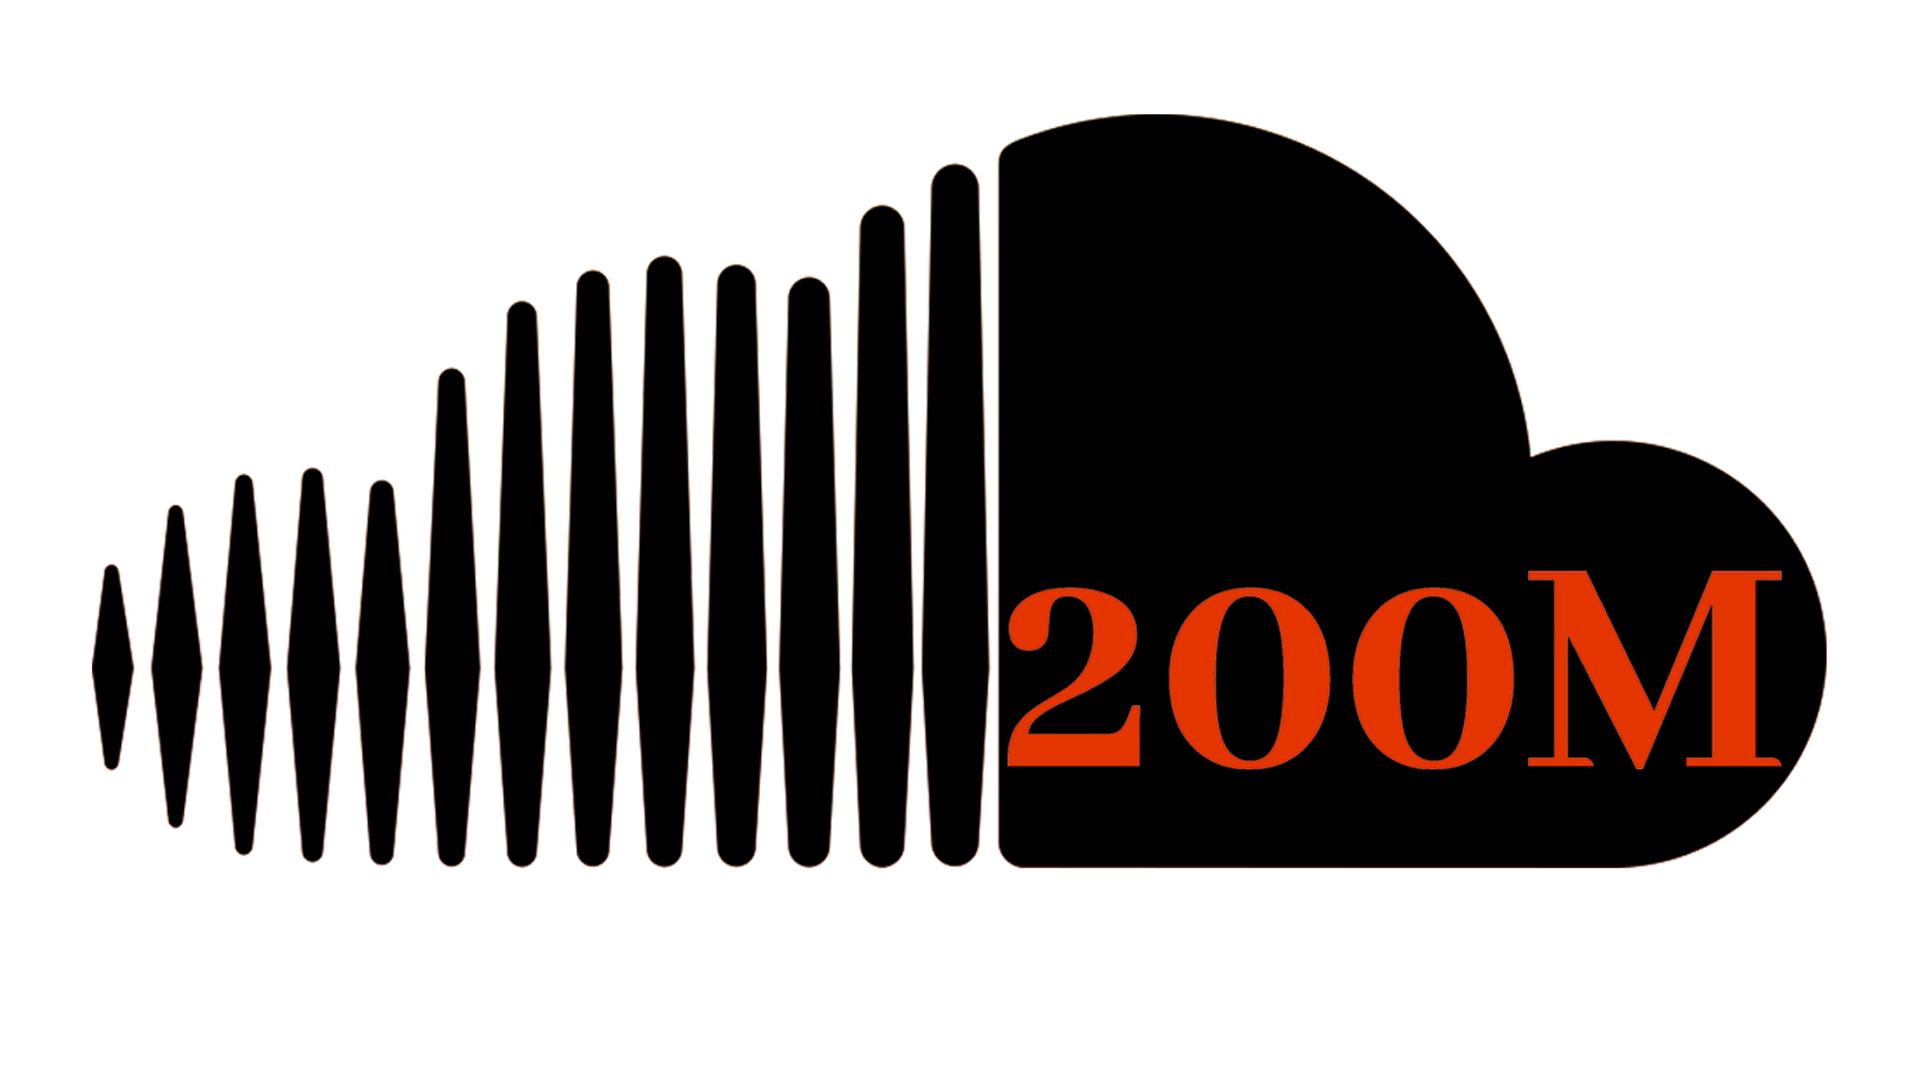 SoundCloud Hits Milestone of 200 Million Tracks Archives